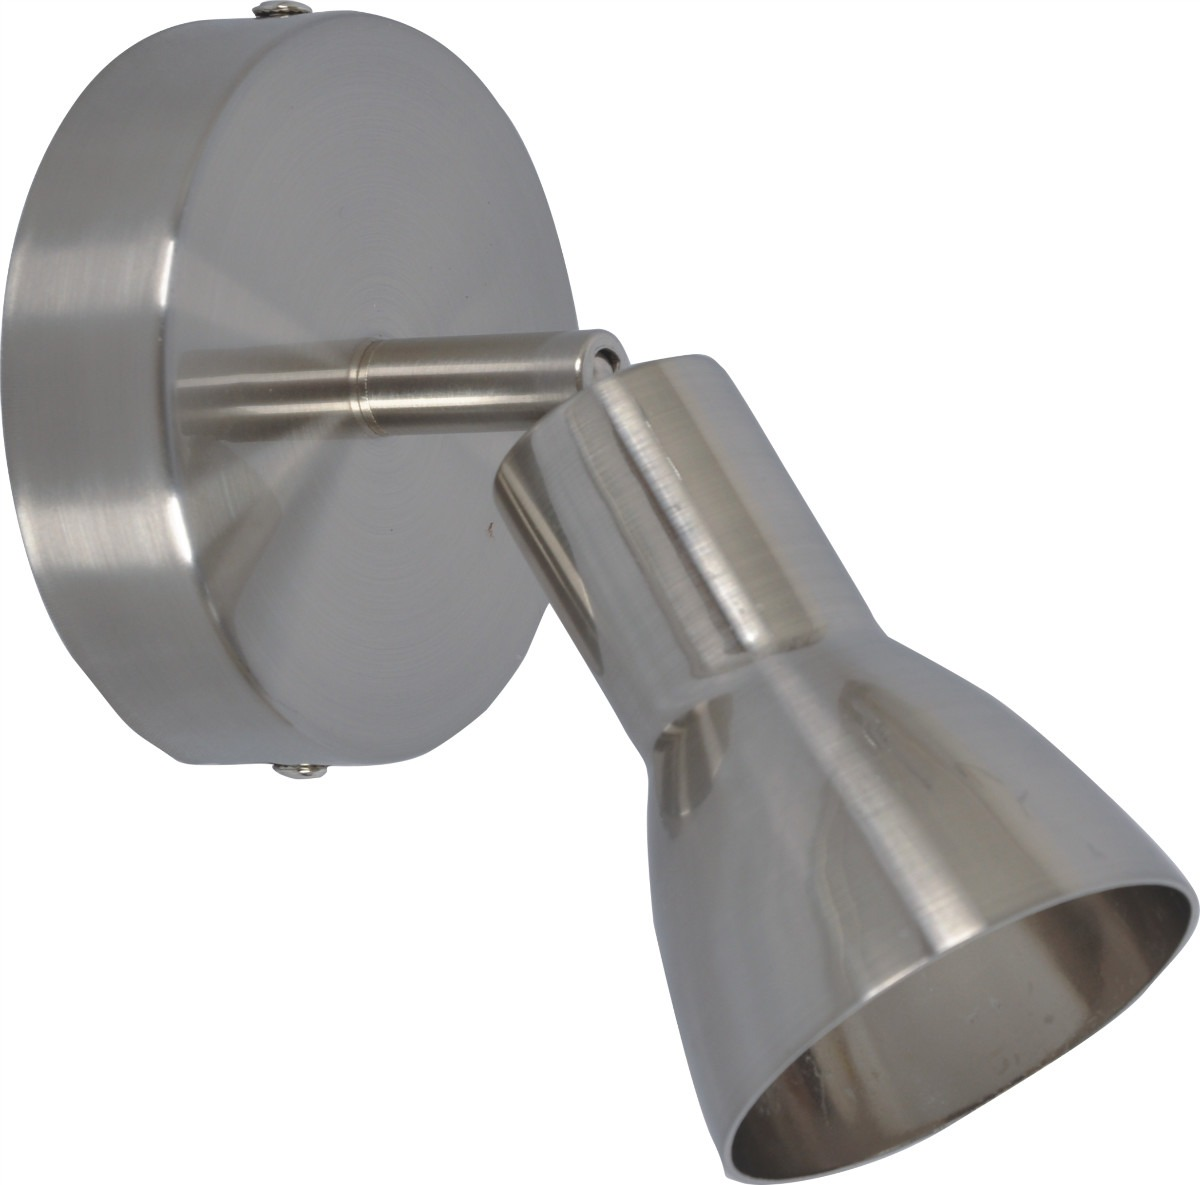 spot armado completo con una lampara dicroica 220v incluida